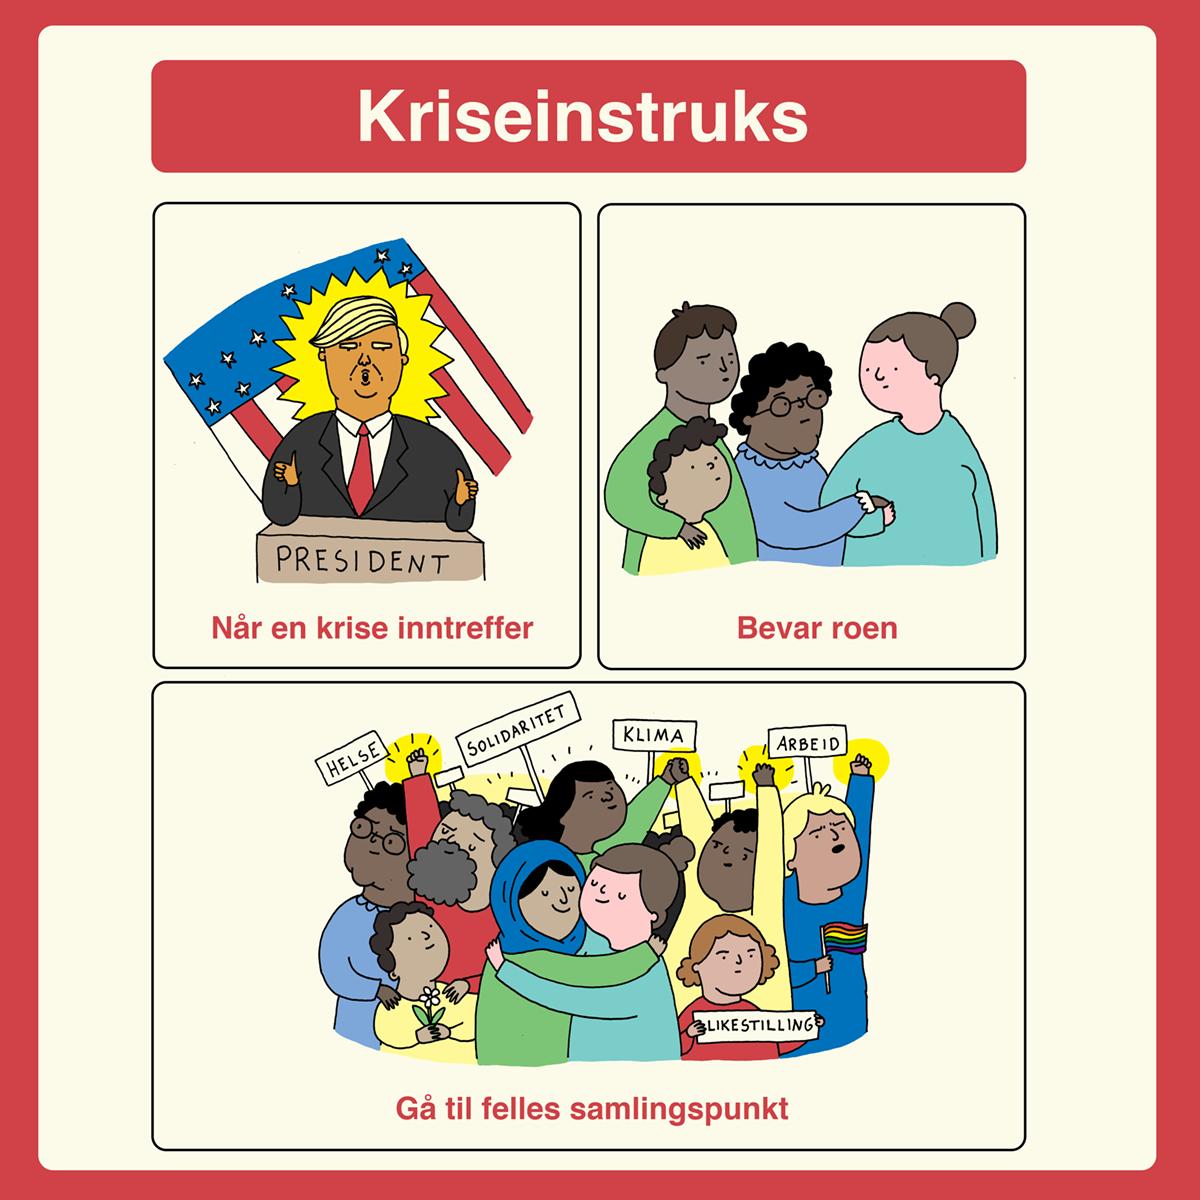 kriseinstruks3